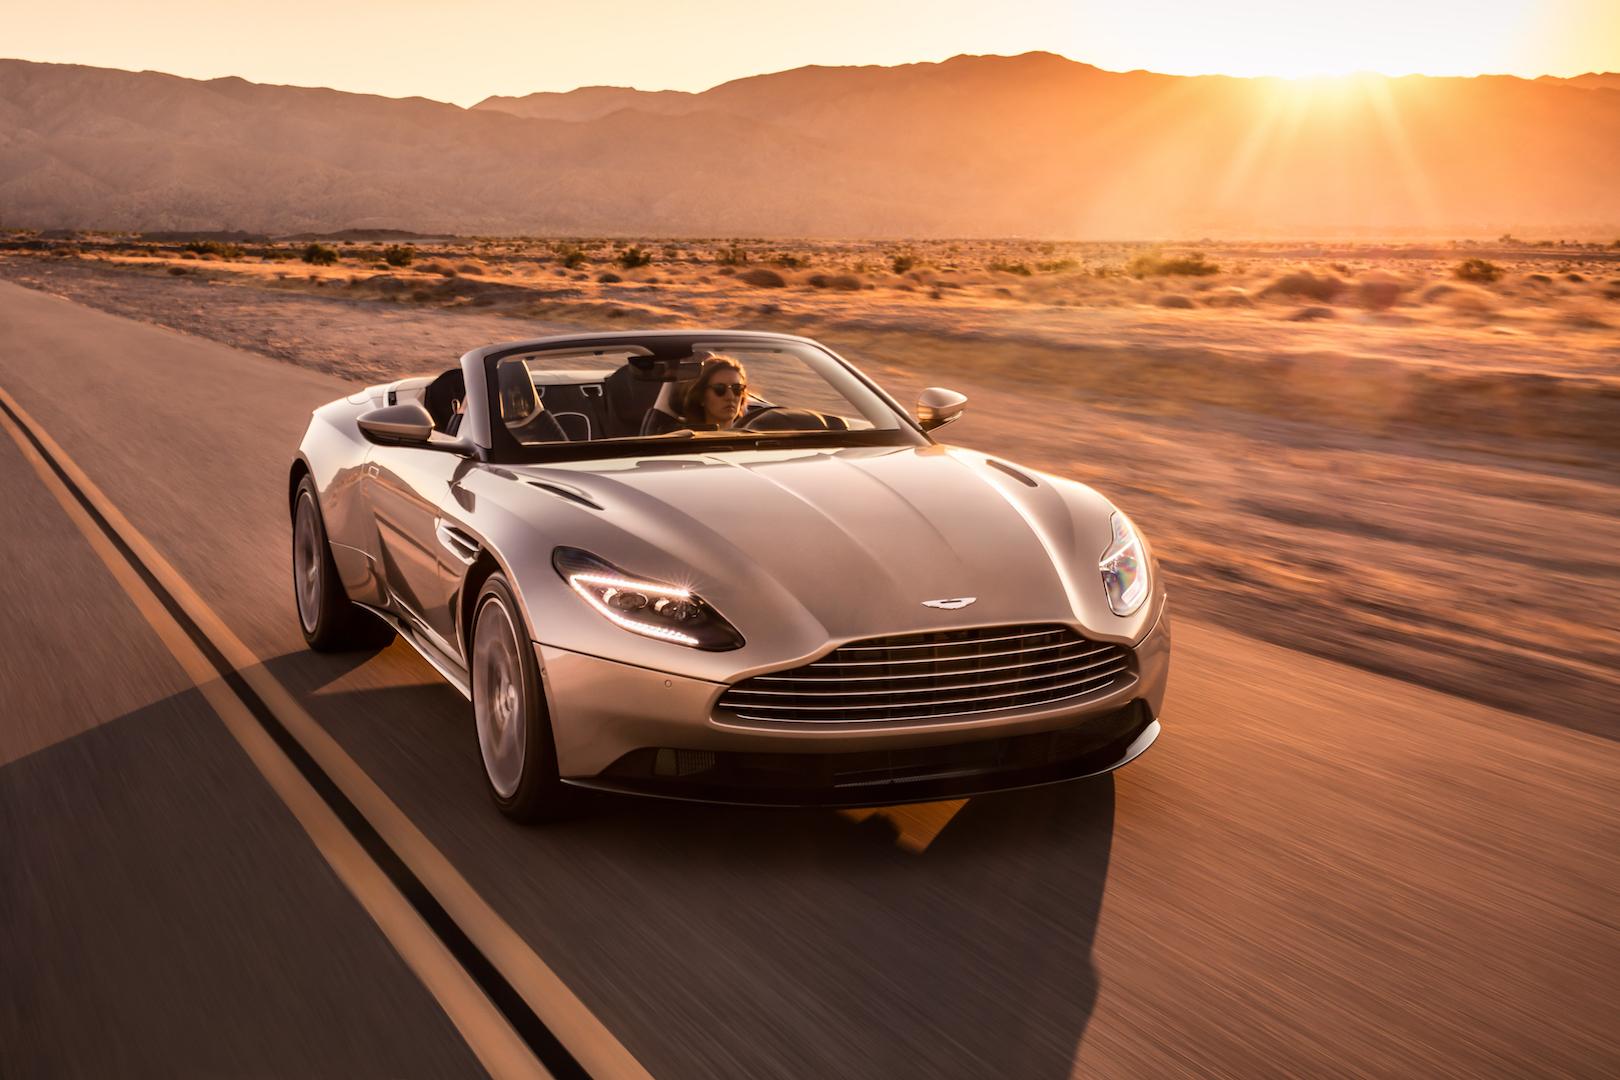 WORLD LXRY New Aston Martin DB11 Volante Convertible III